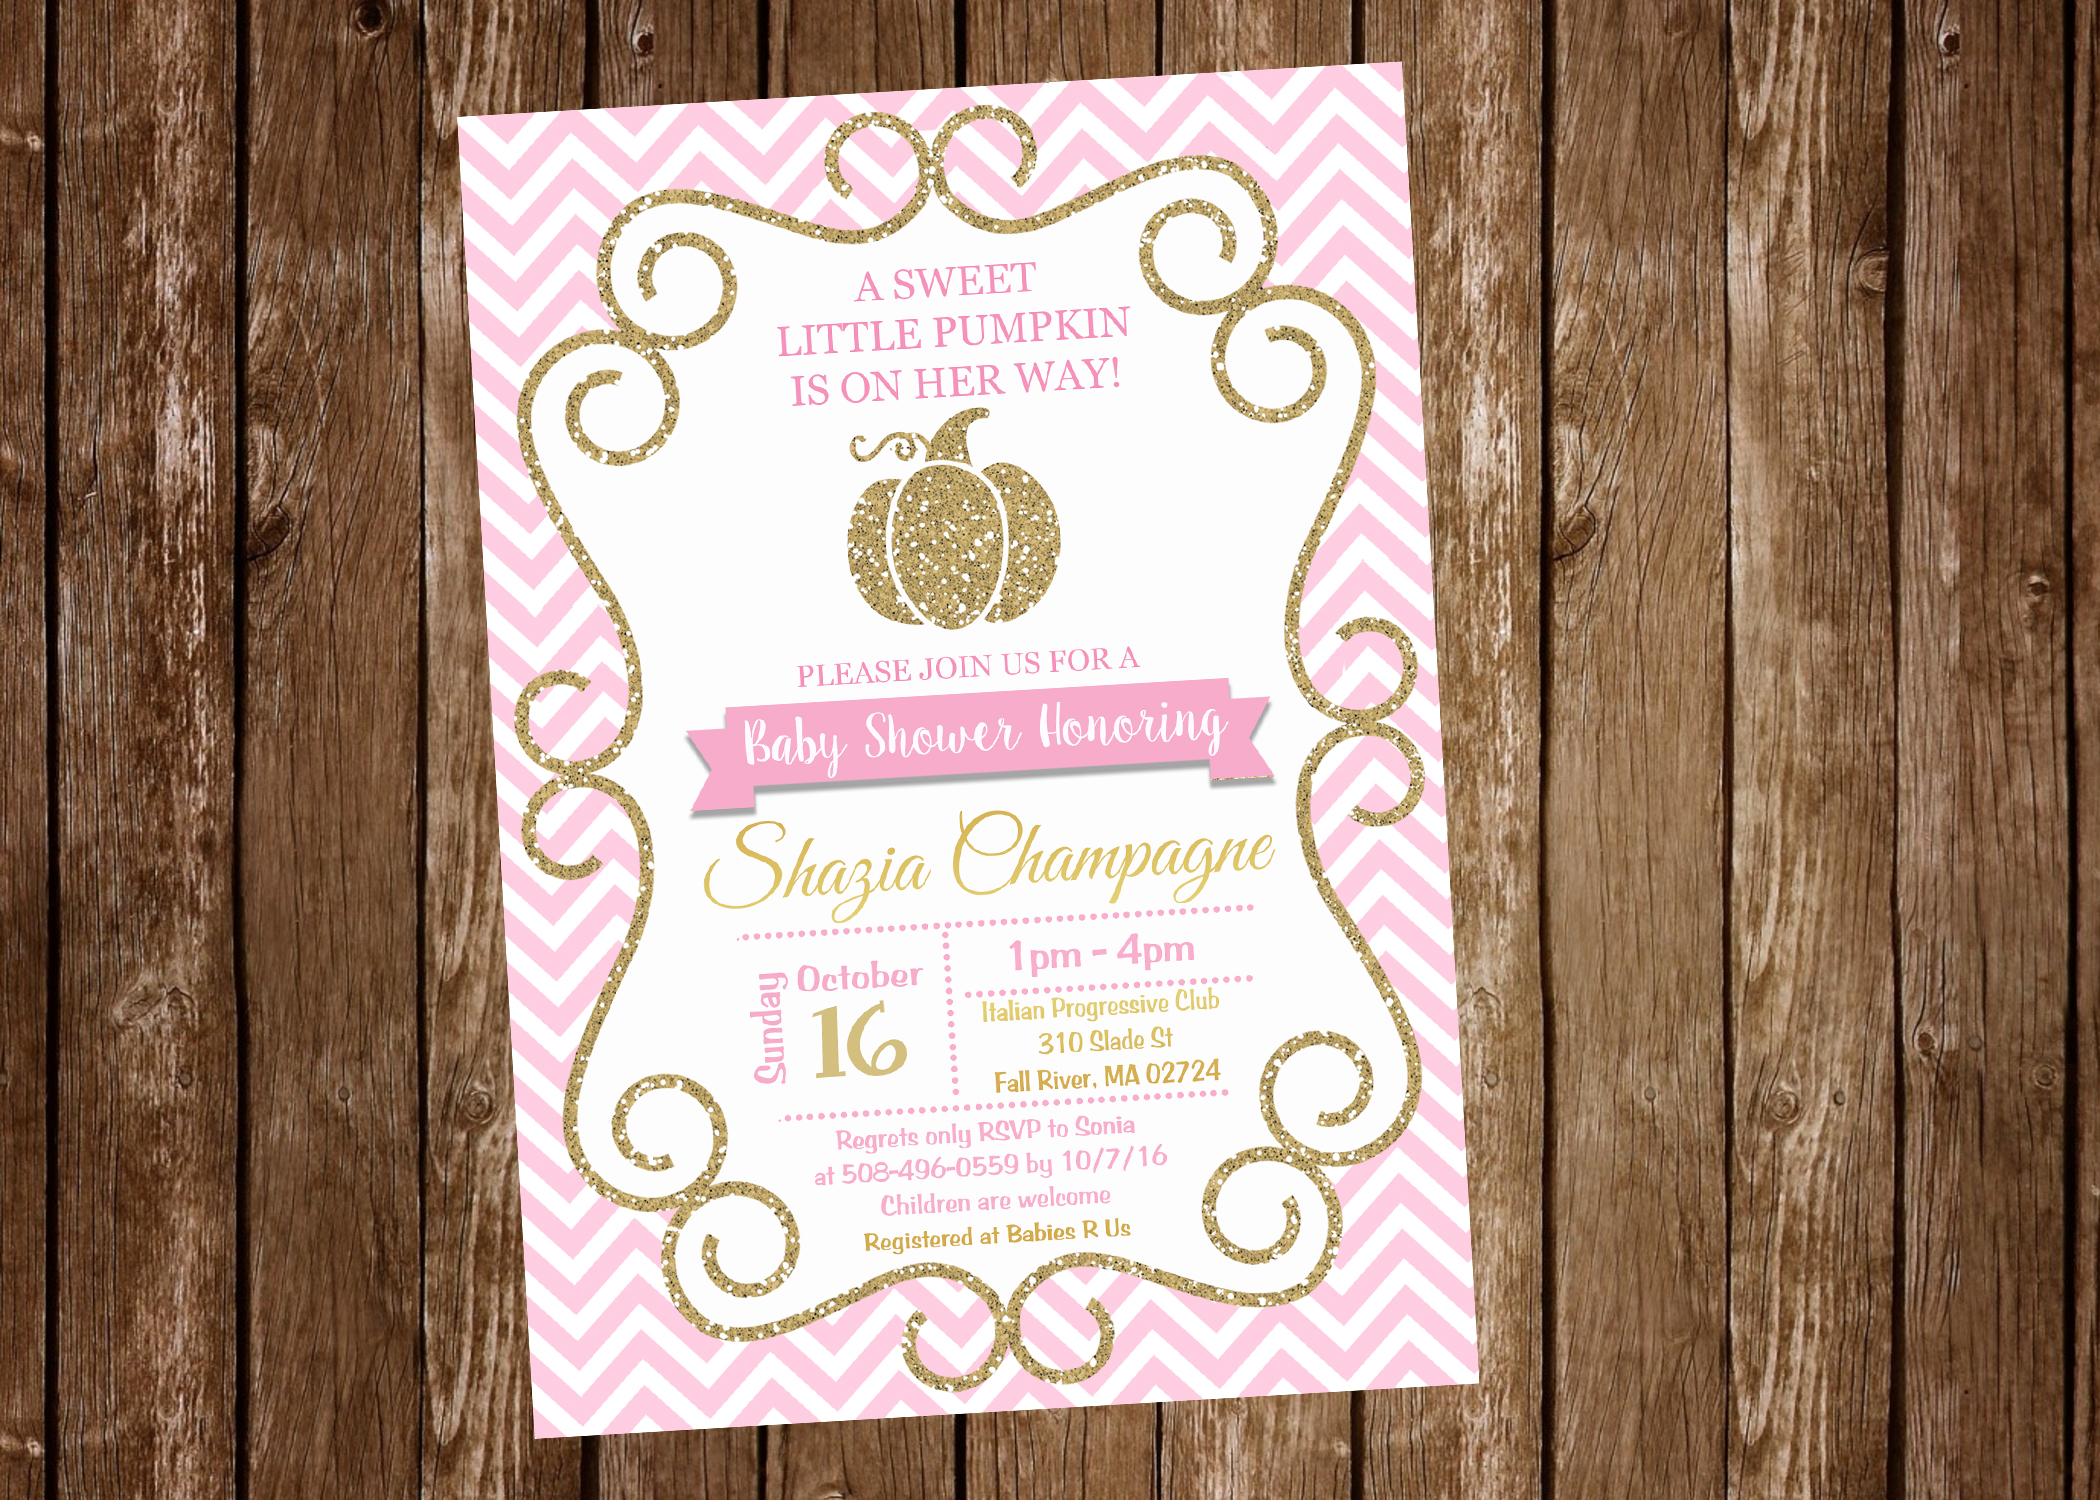 Pumpkin pink gold girl baby shower invitation digital or pumpkin pink gold girl baby shower invitation digital or printed filmwisefo